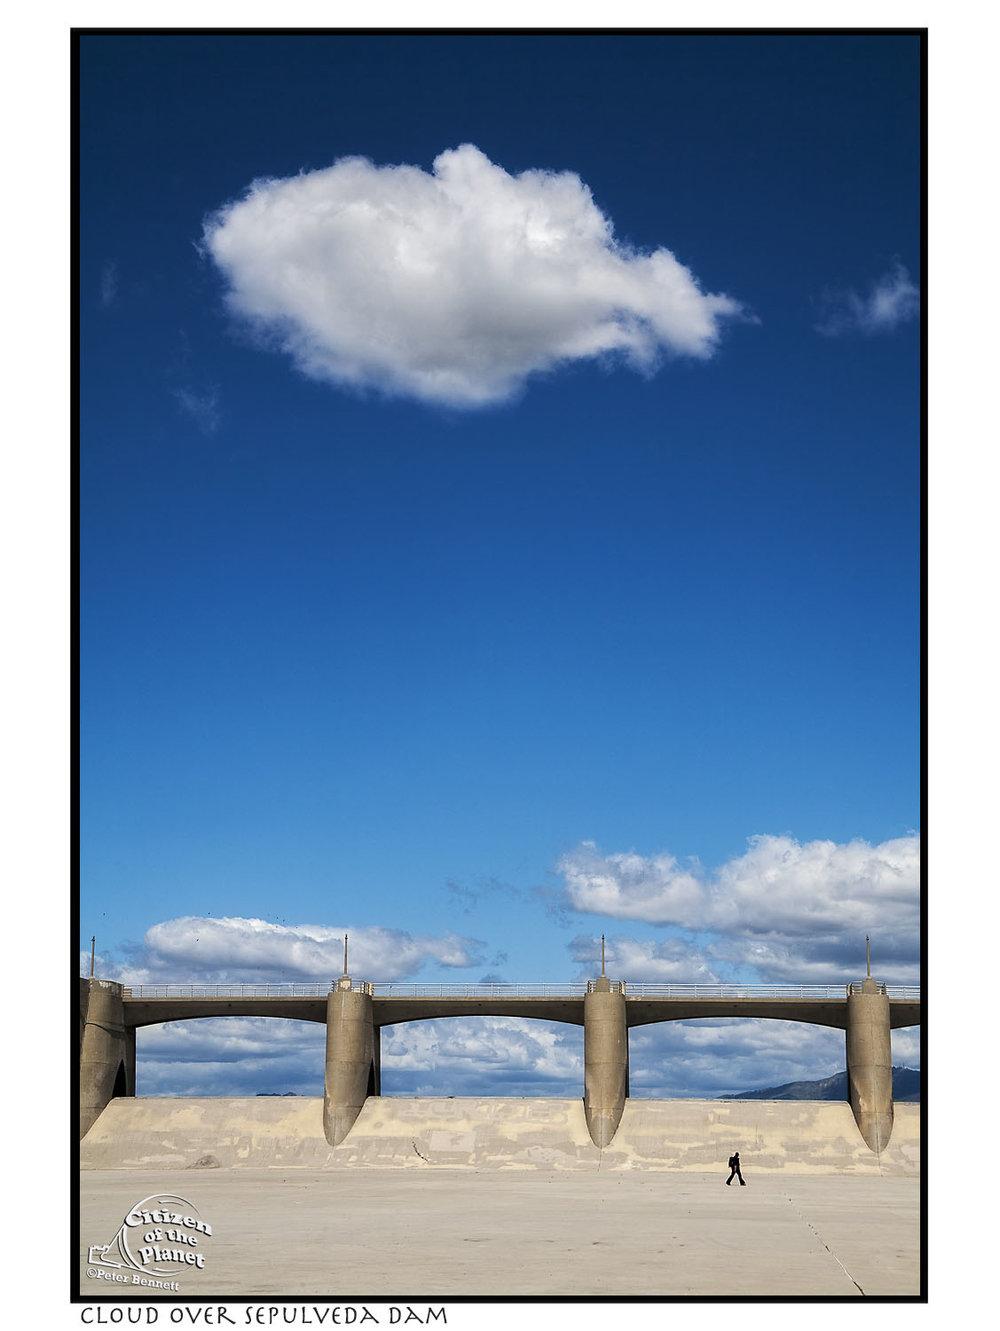 cloud_over_sepulveda_dam.jpg